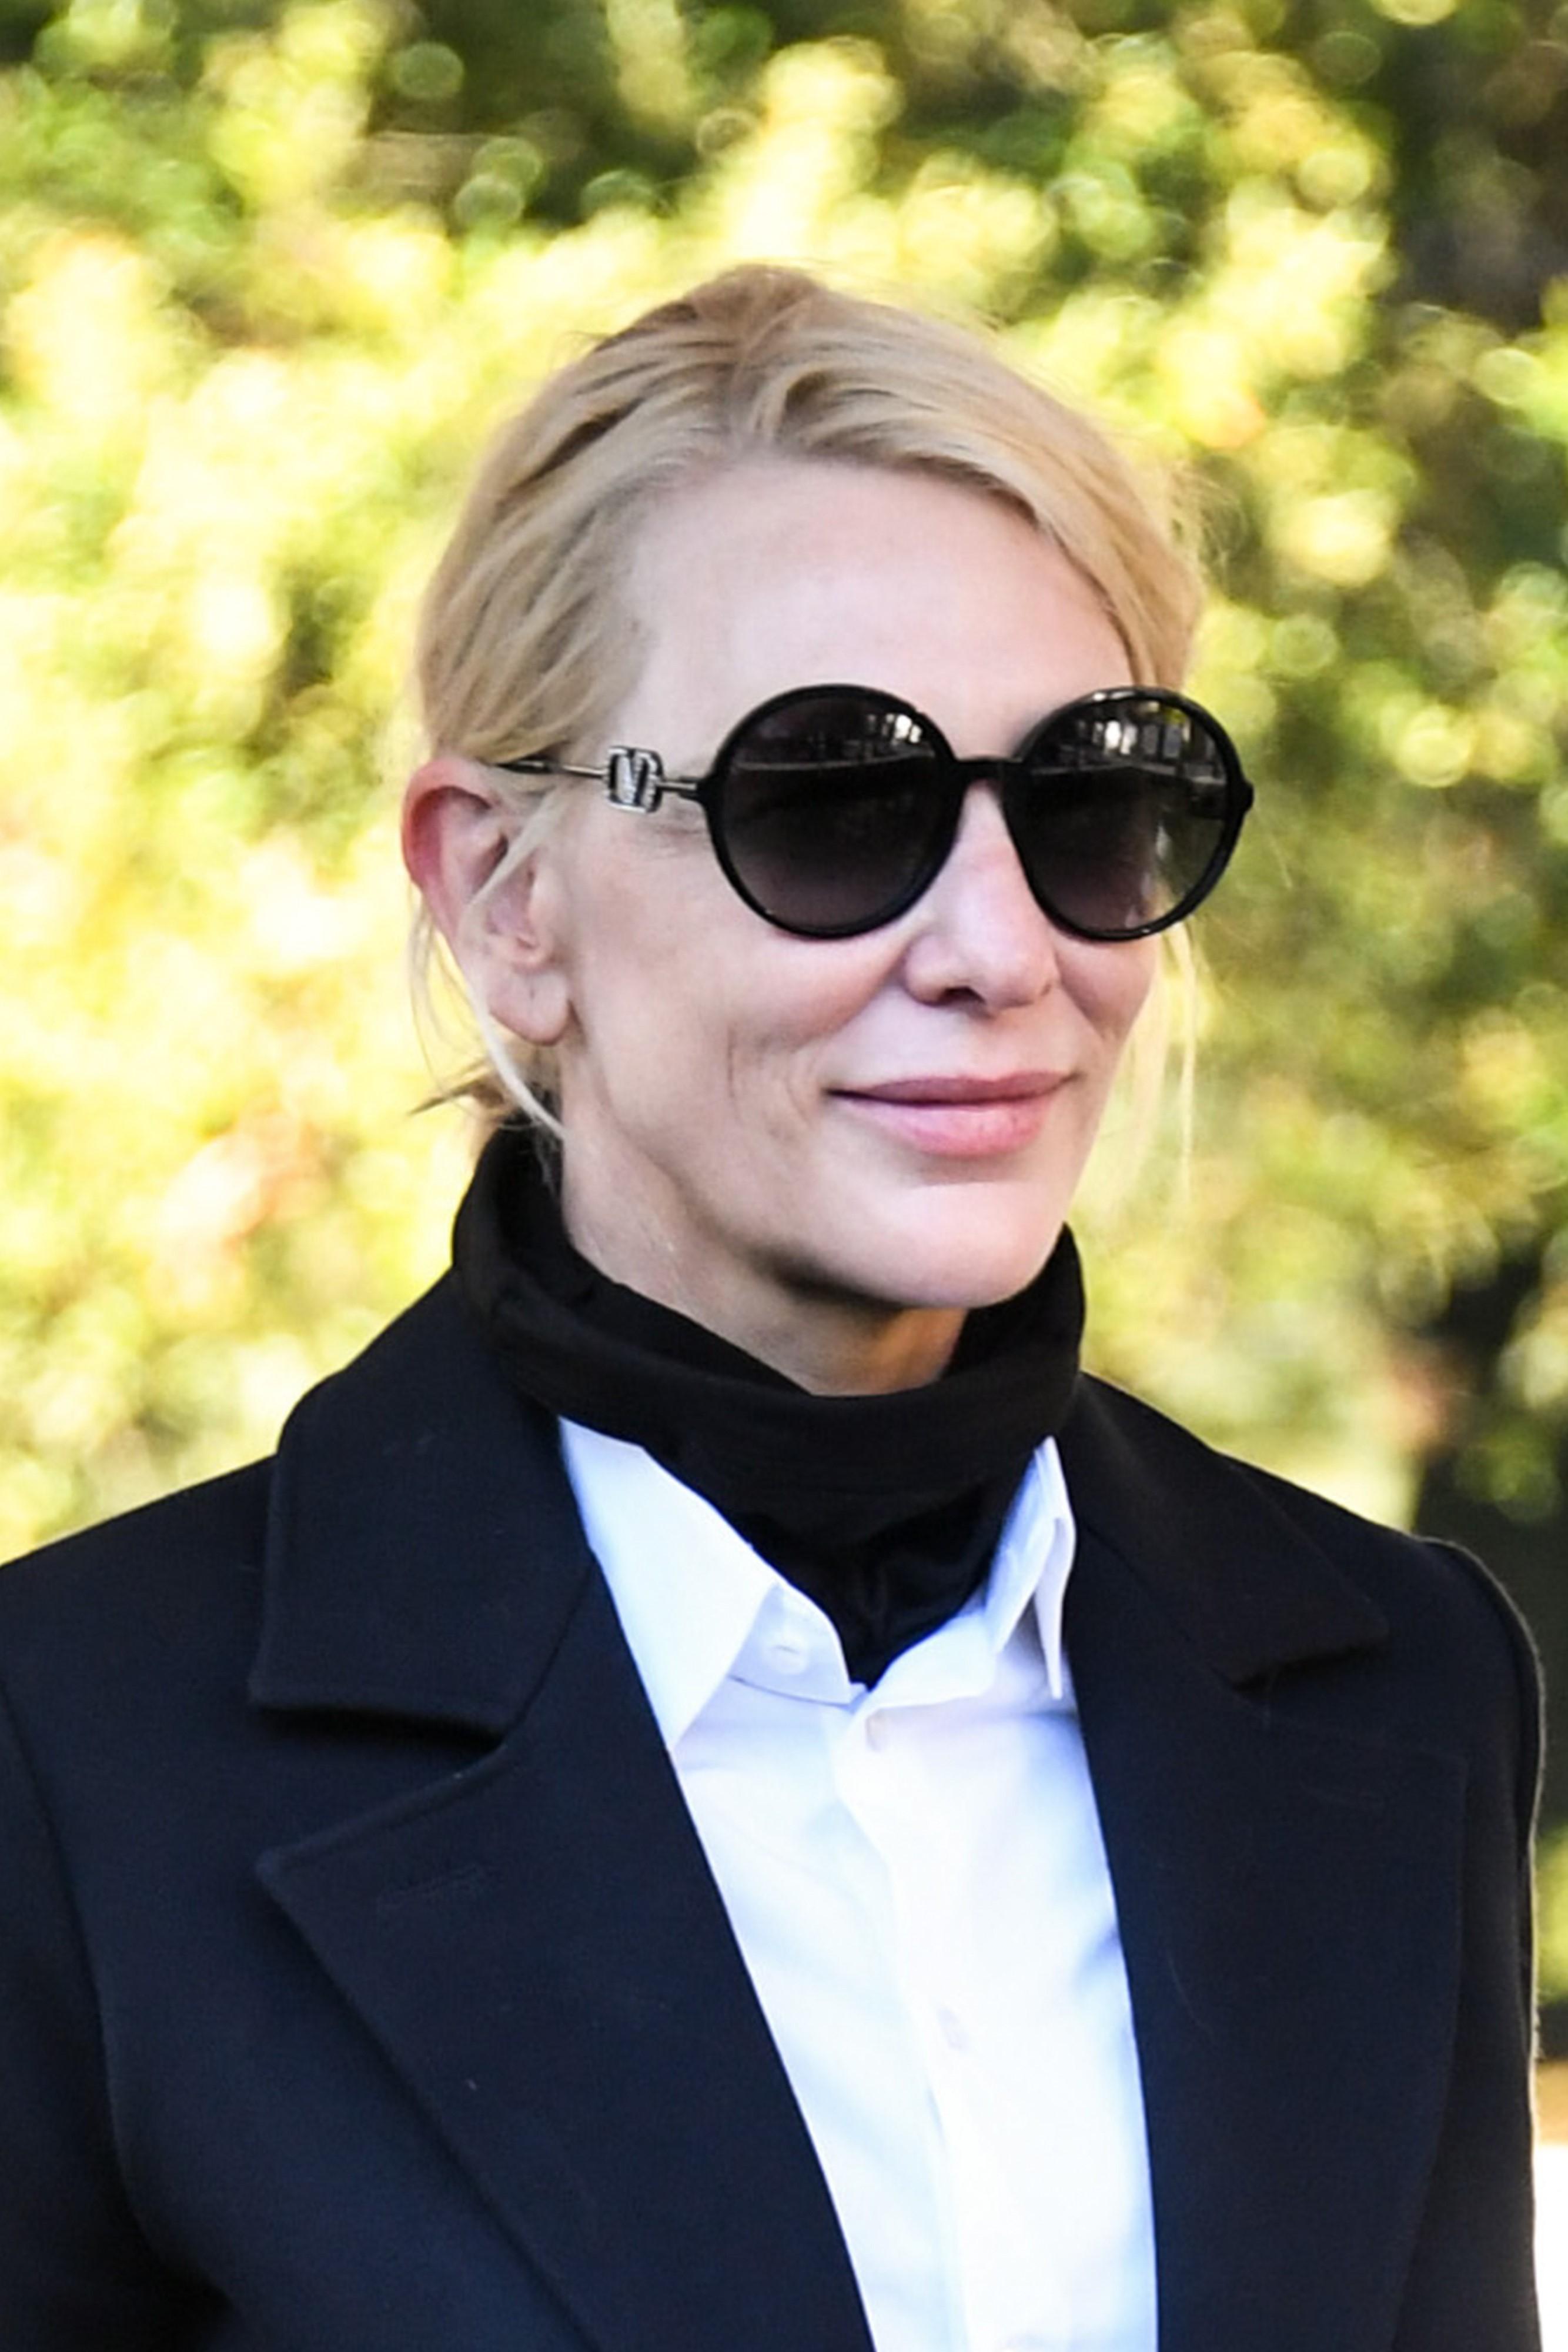 occhiali da sole Venezia 77